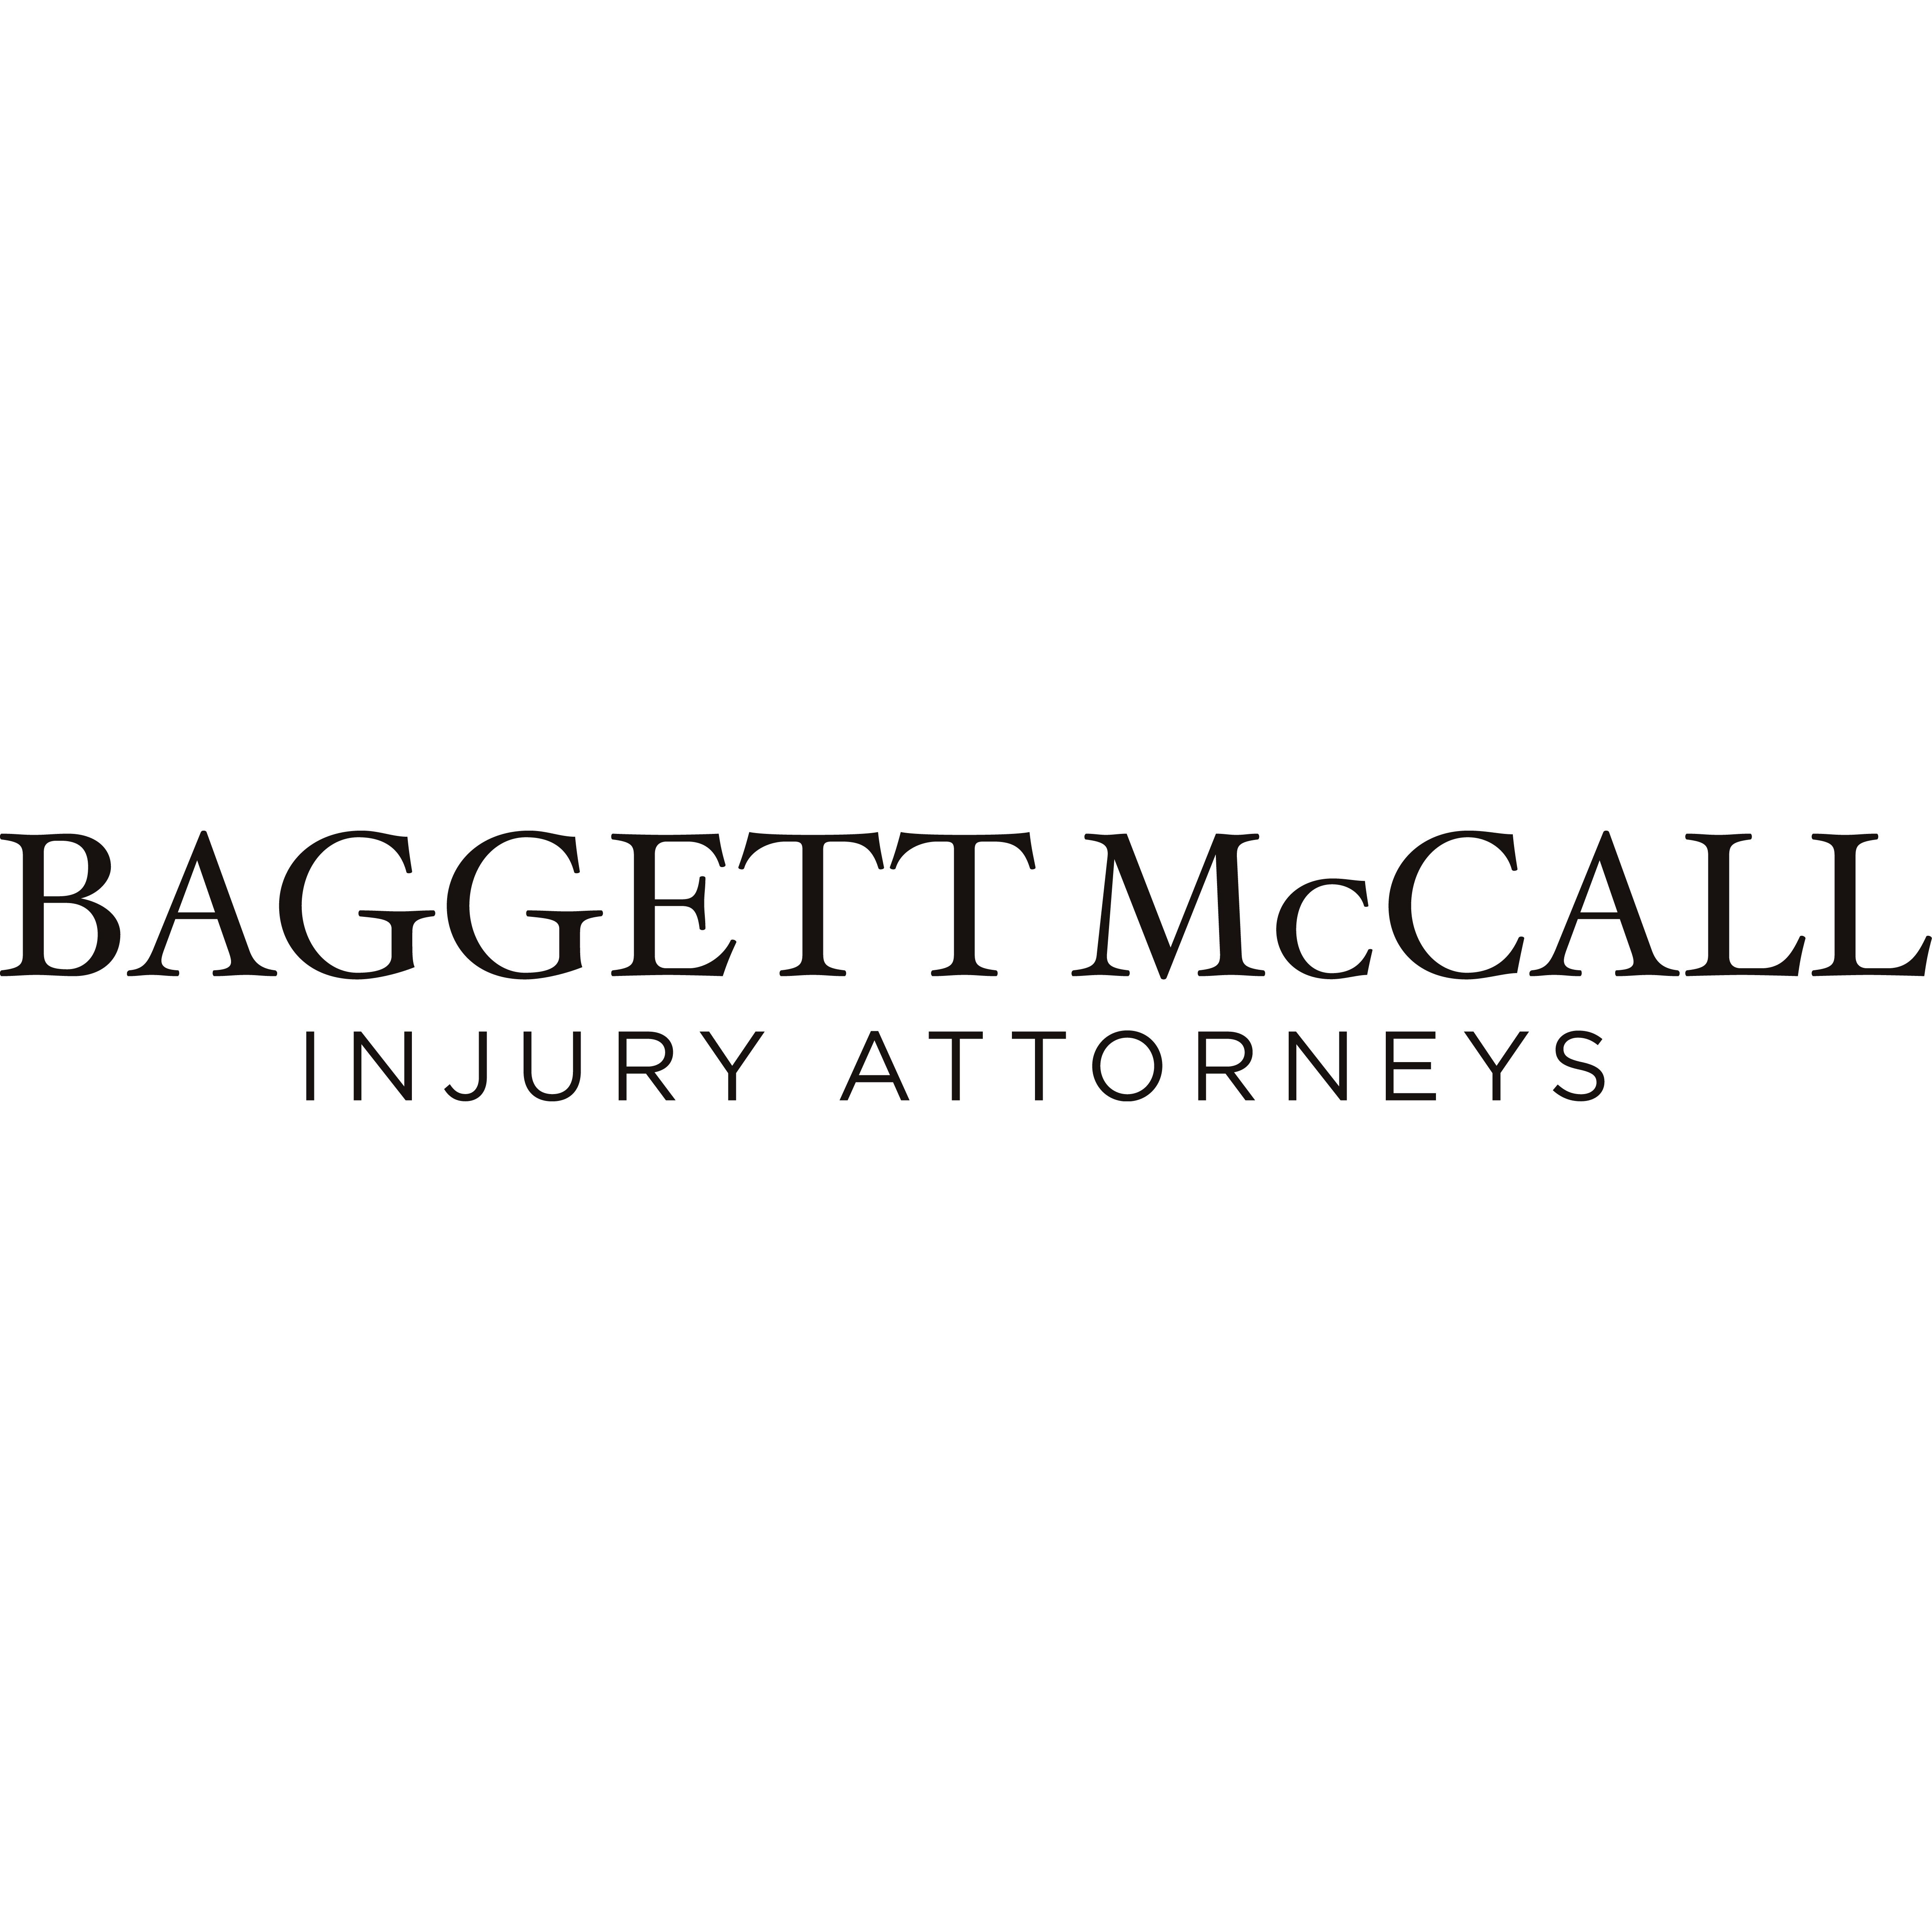 Baggett McCall Injury Attorneys